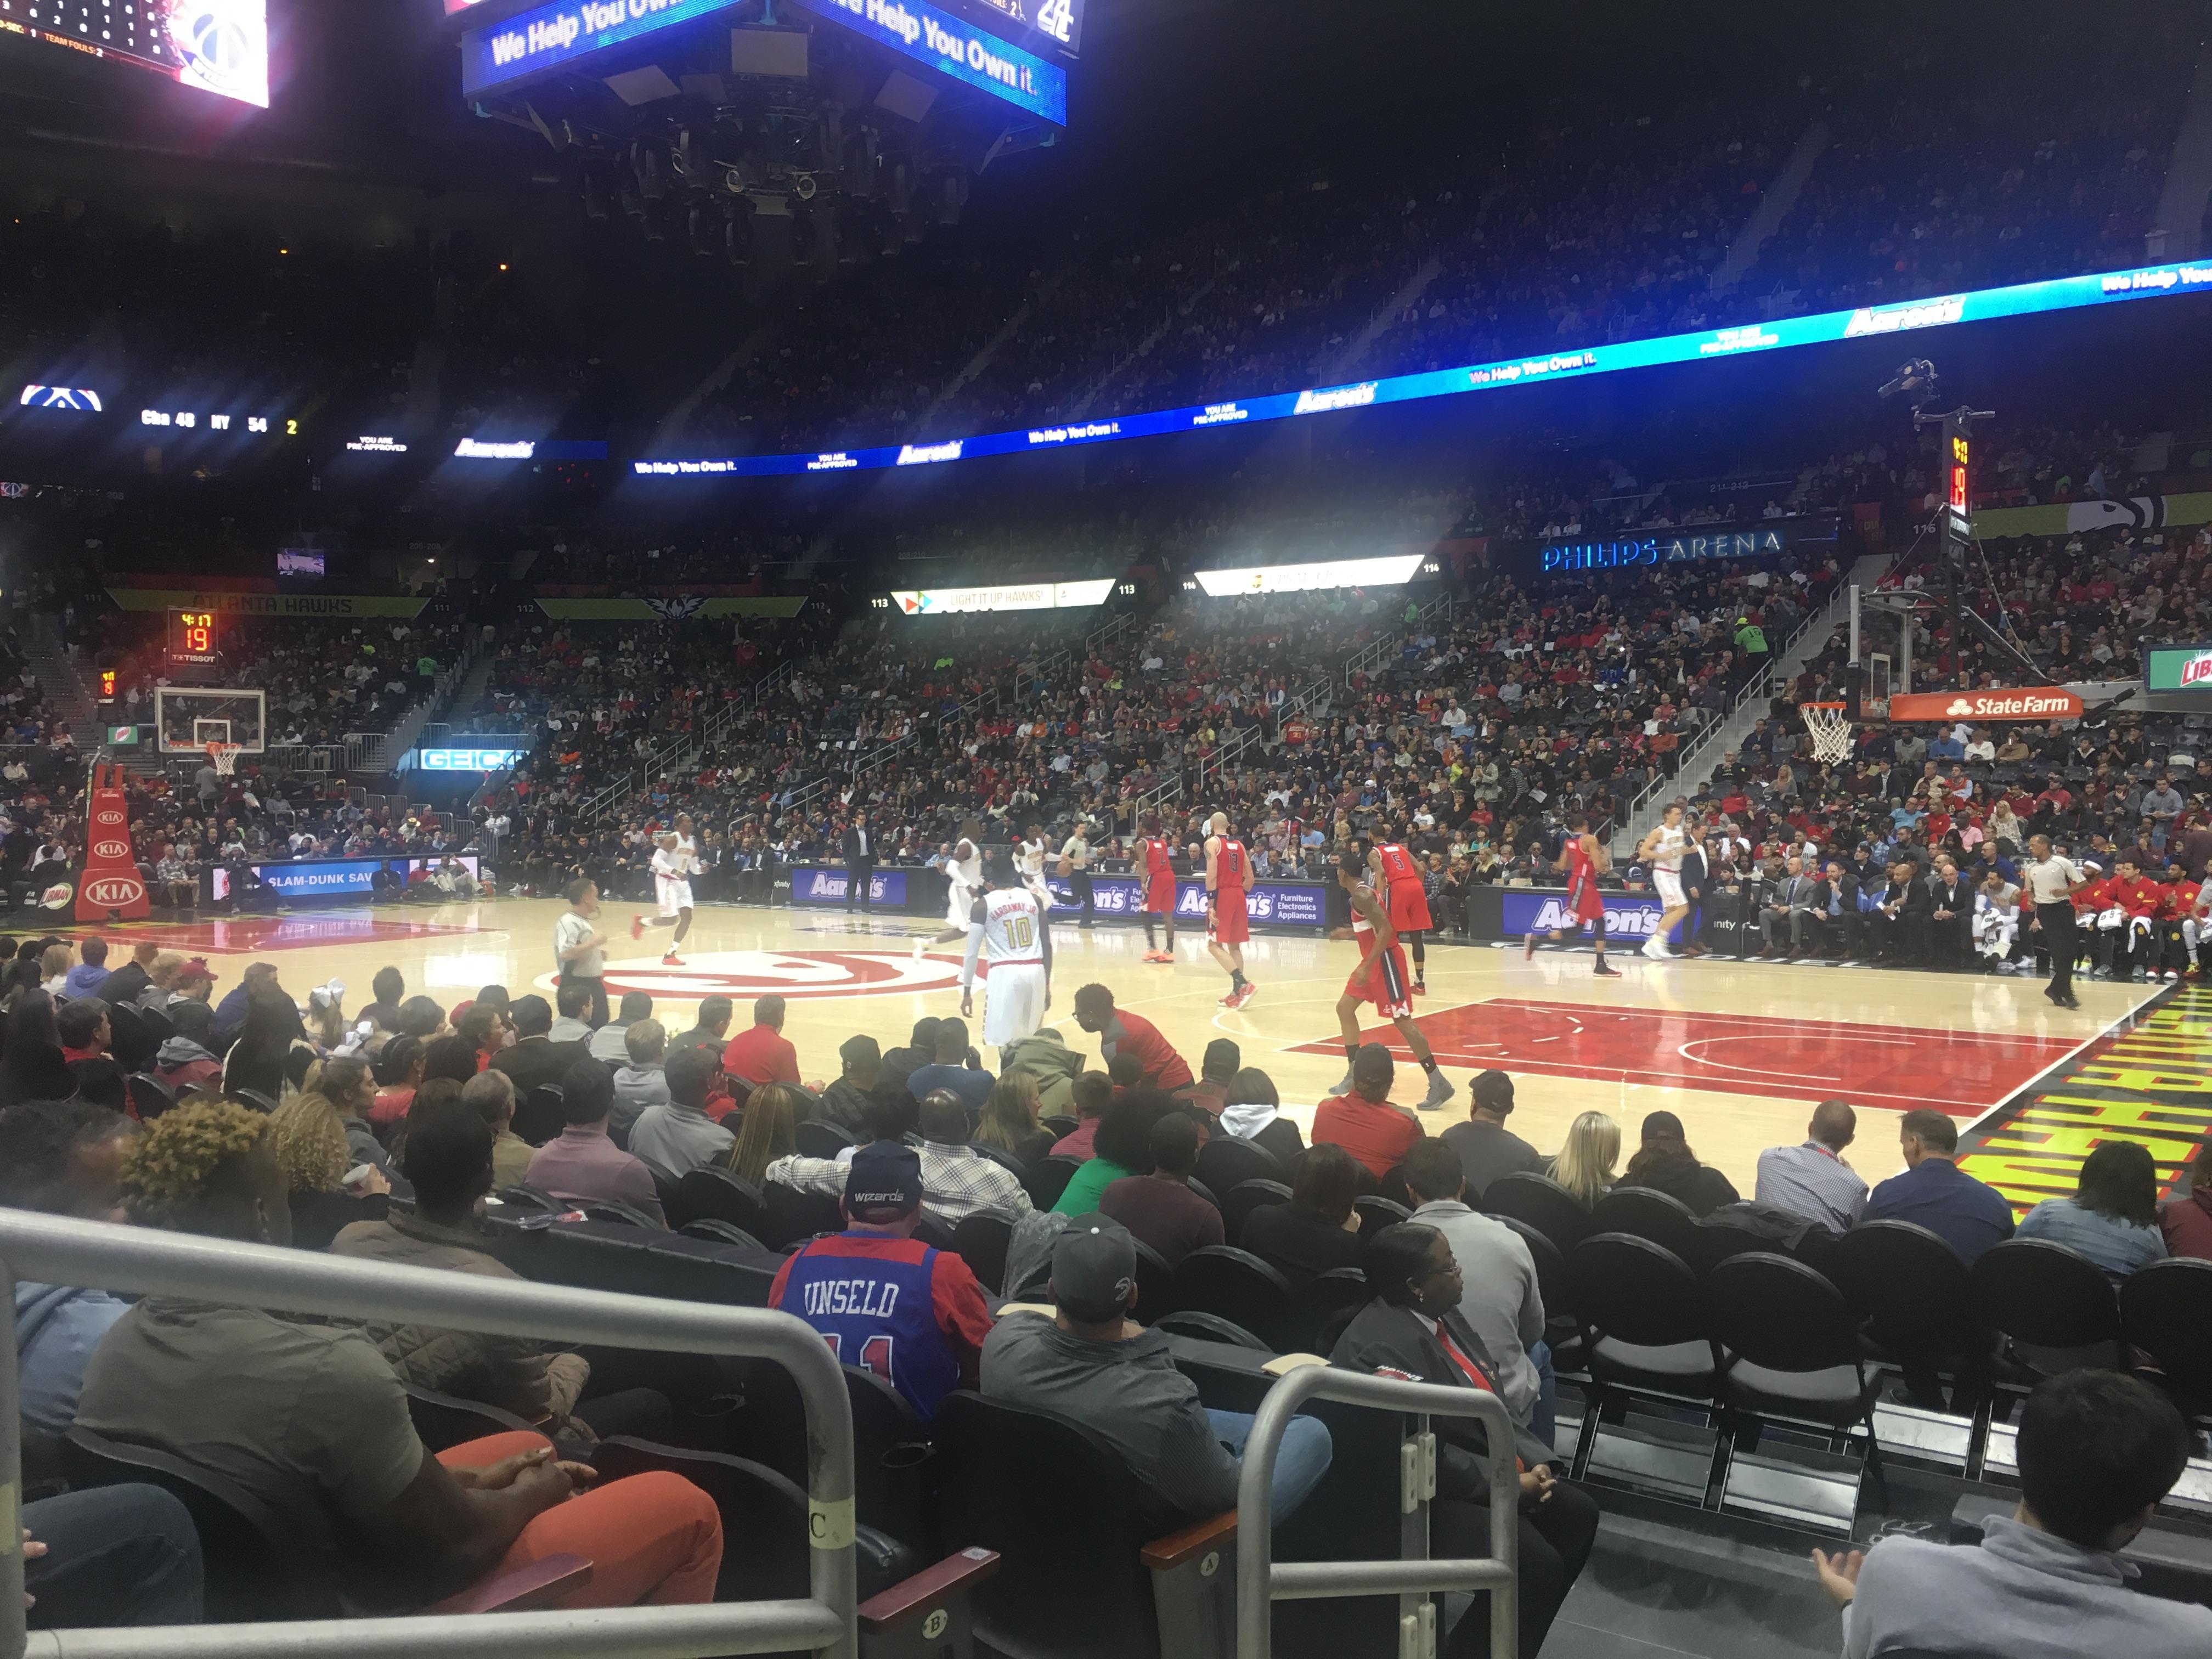 State Farm Arena Section 106 Row E Seat 9-10